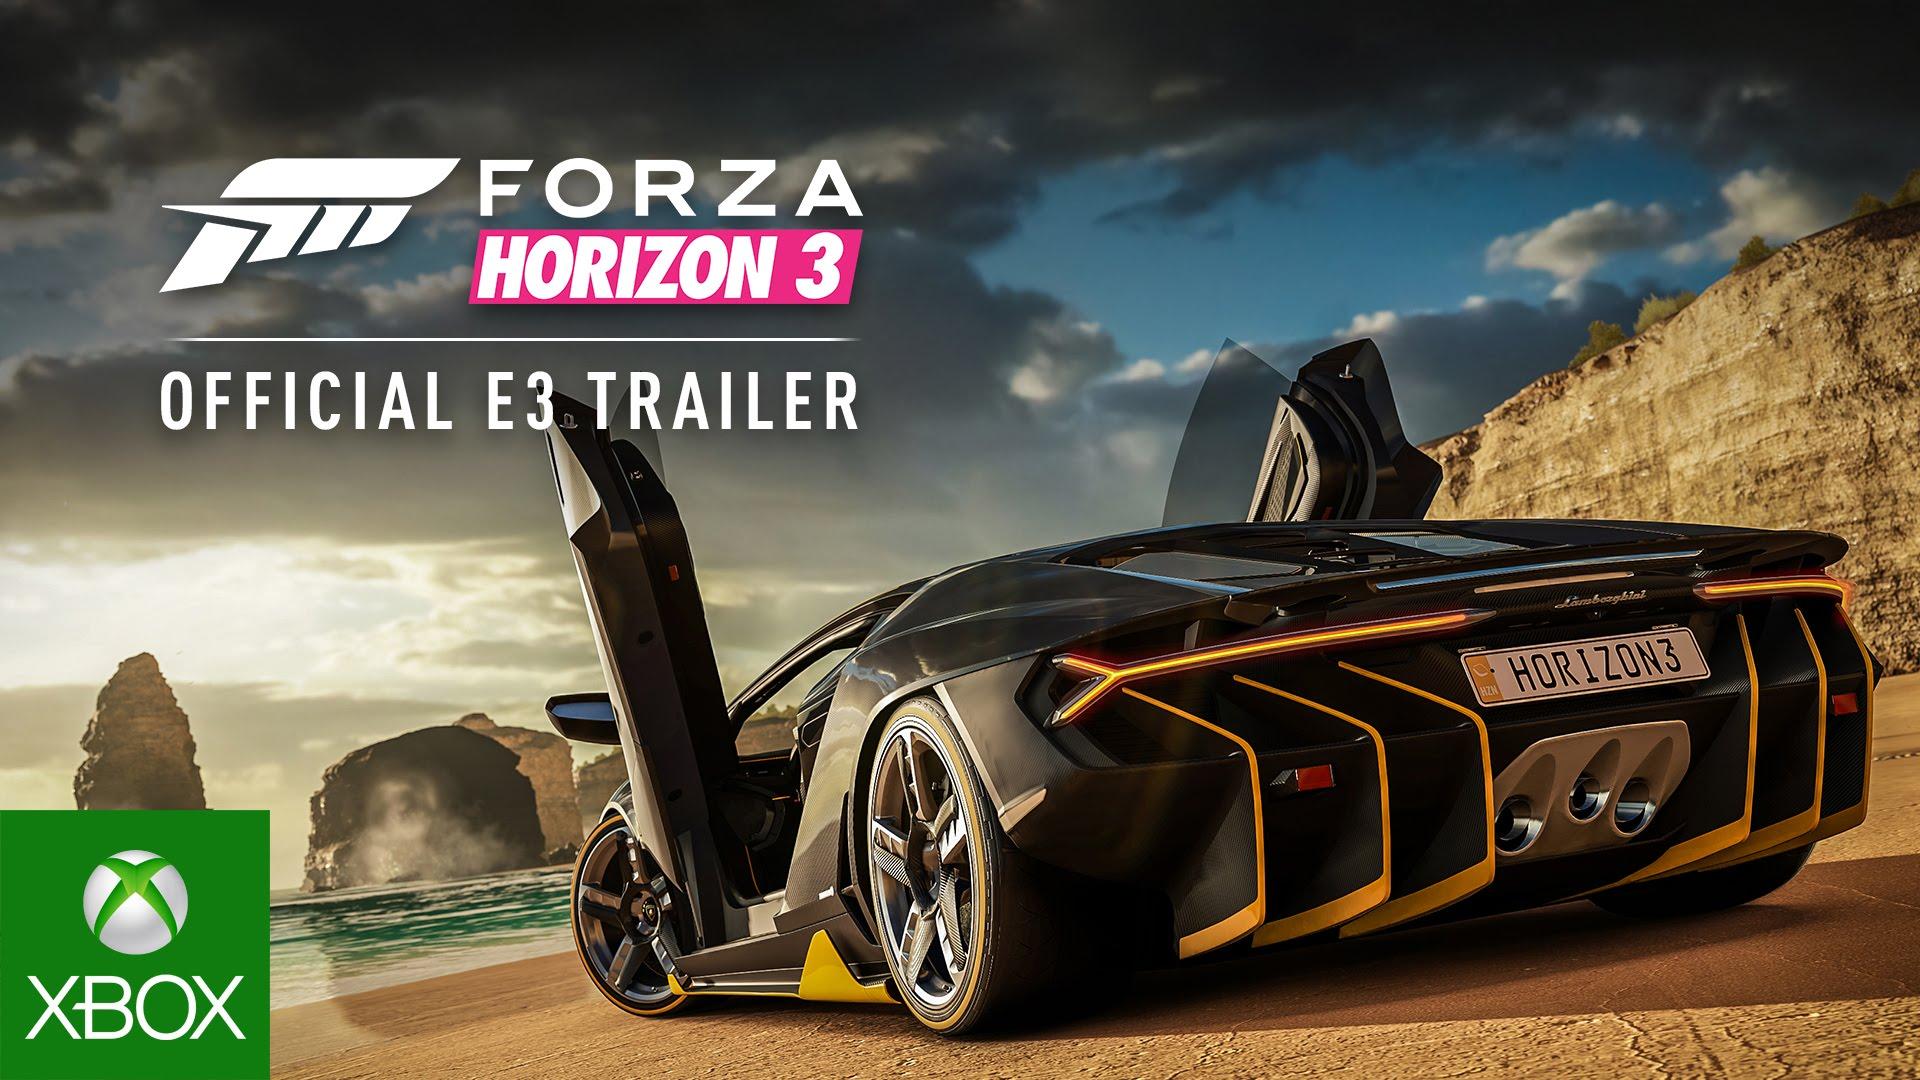 Forza Horizon 3 dezvăluit oficial la E3 2016